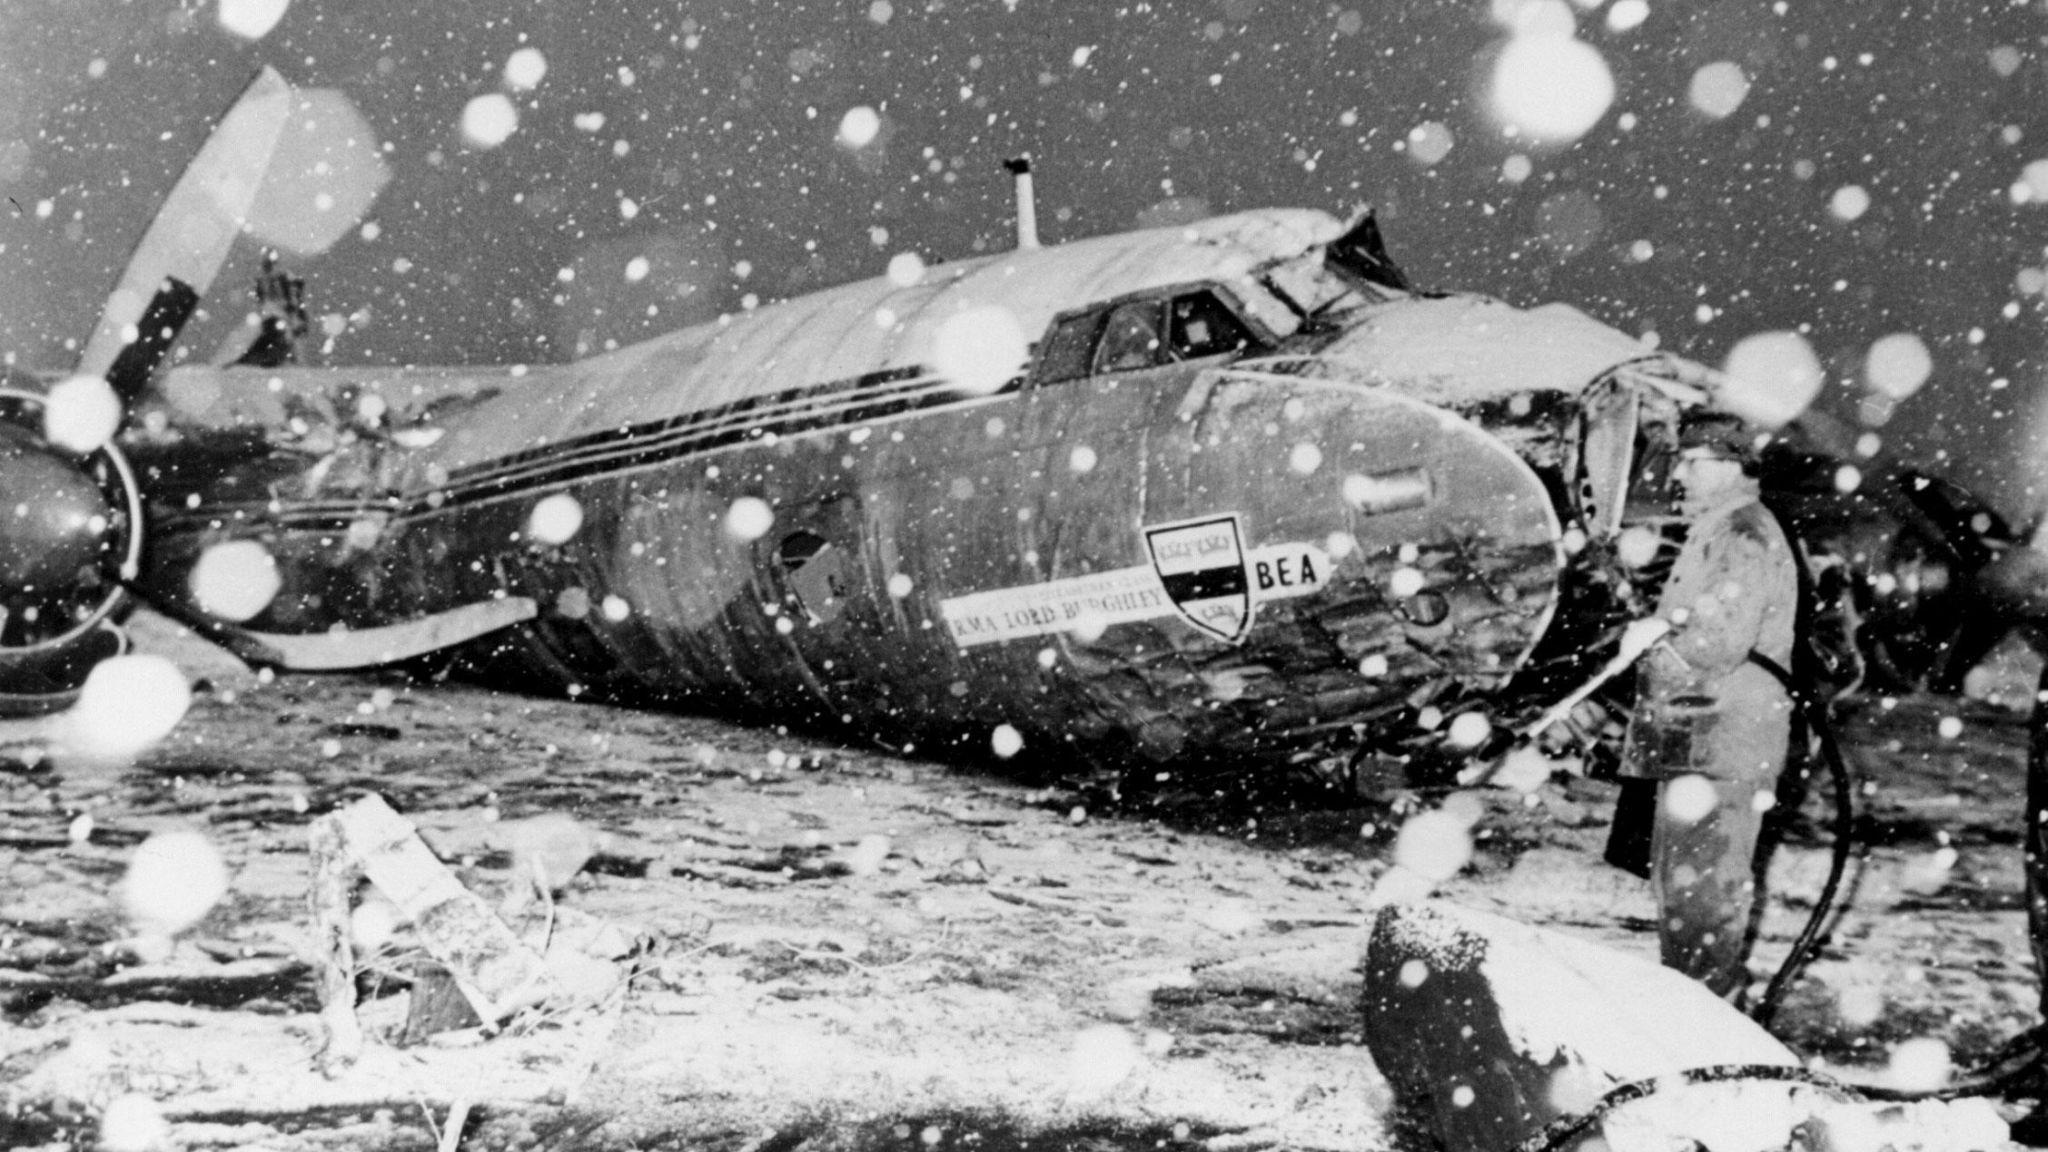 skynews-munich-air-disaster_4213062.jpg (339.15 Kb)